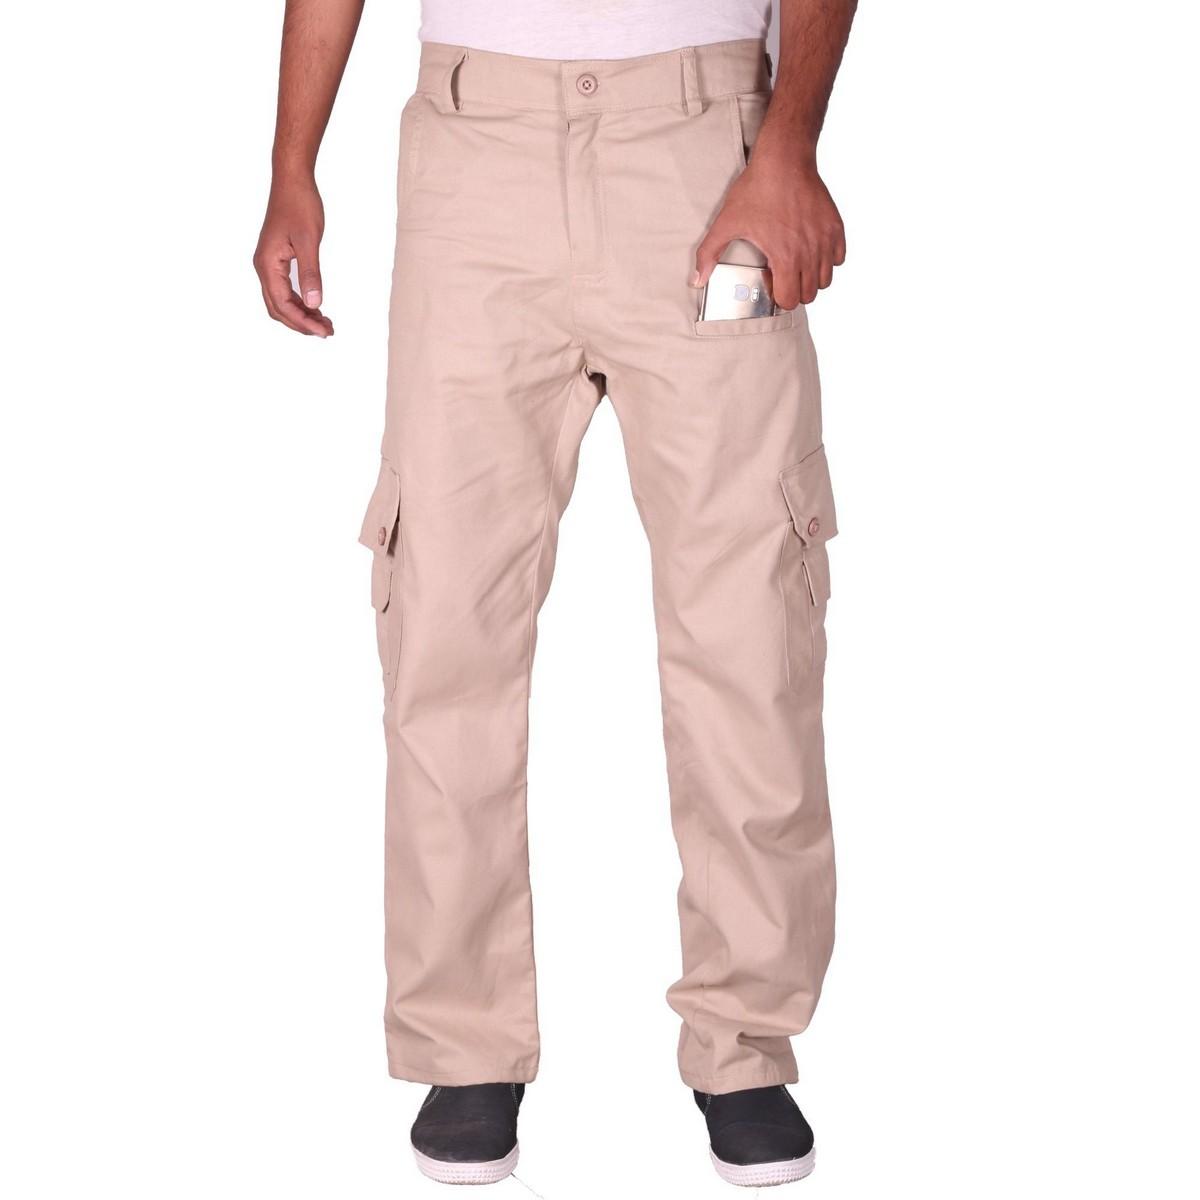 Khaki Pro Cargo Pant - Cargo Trousers